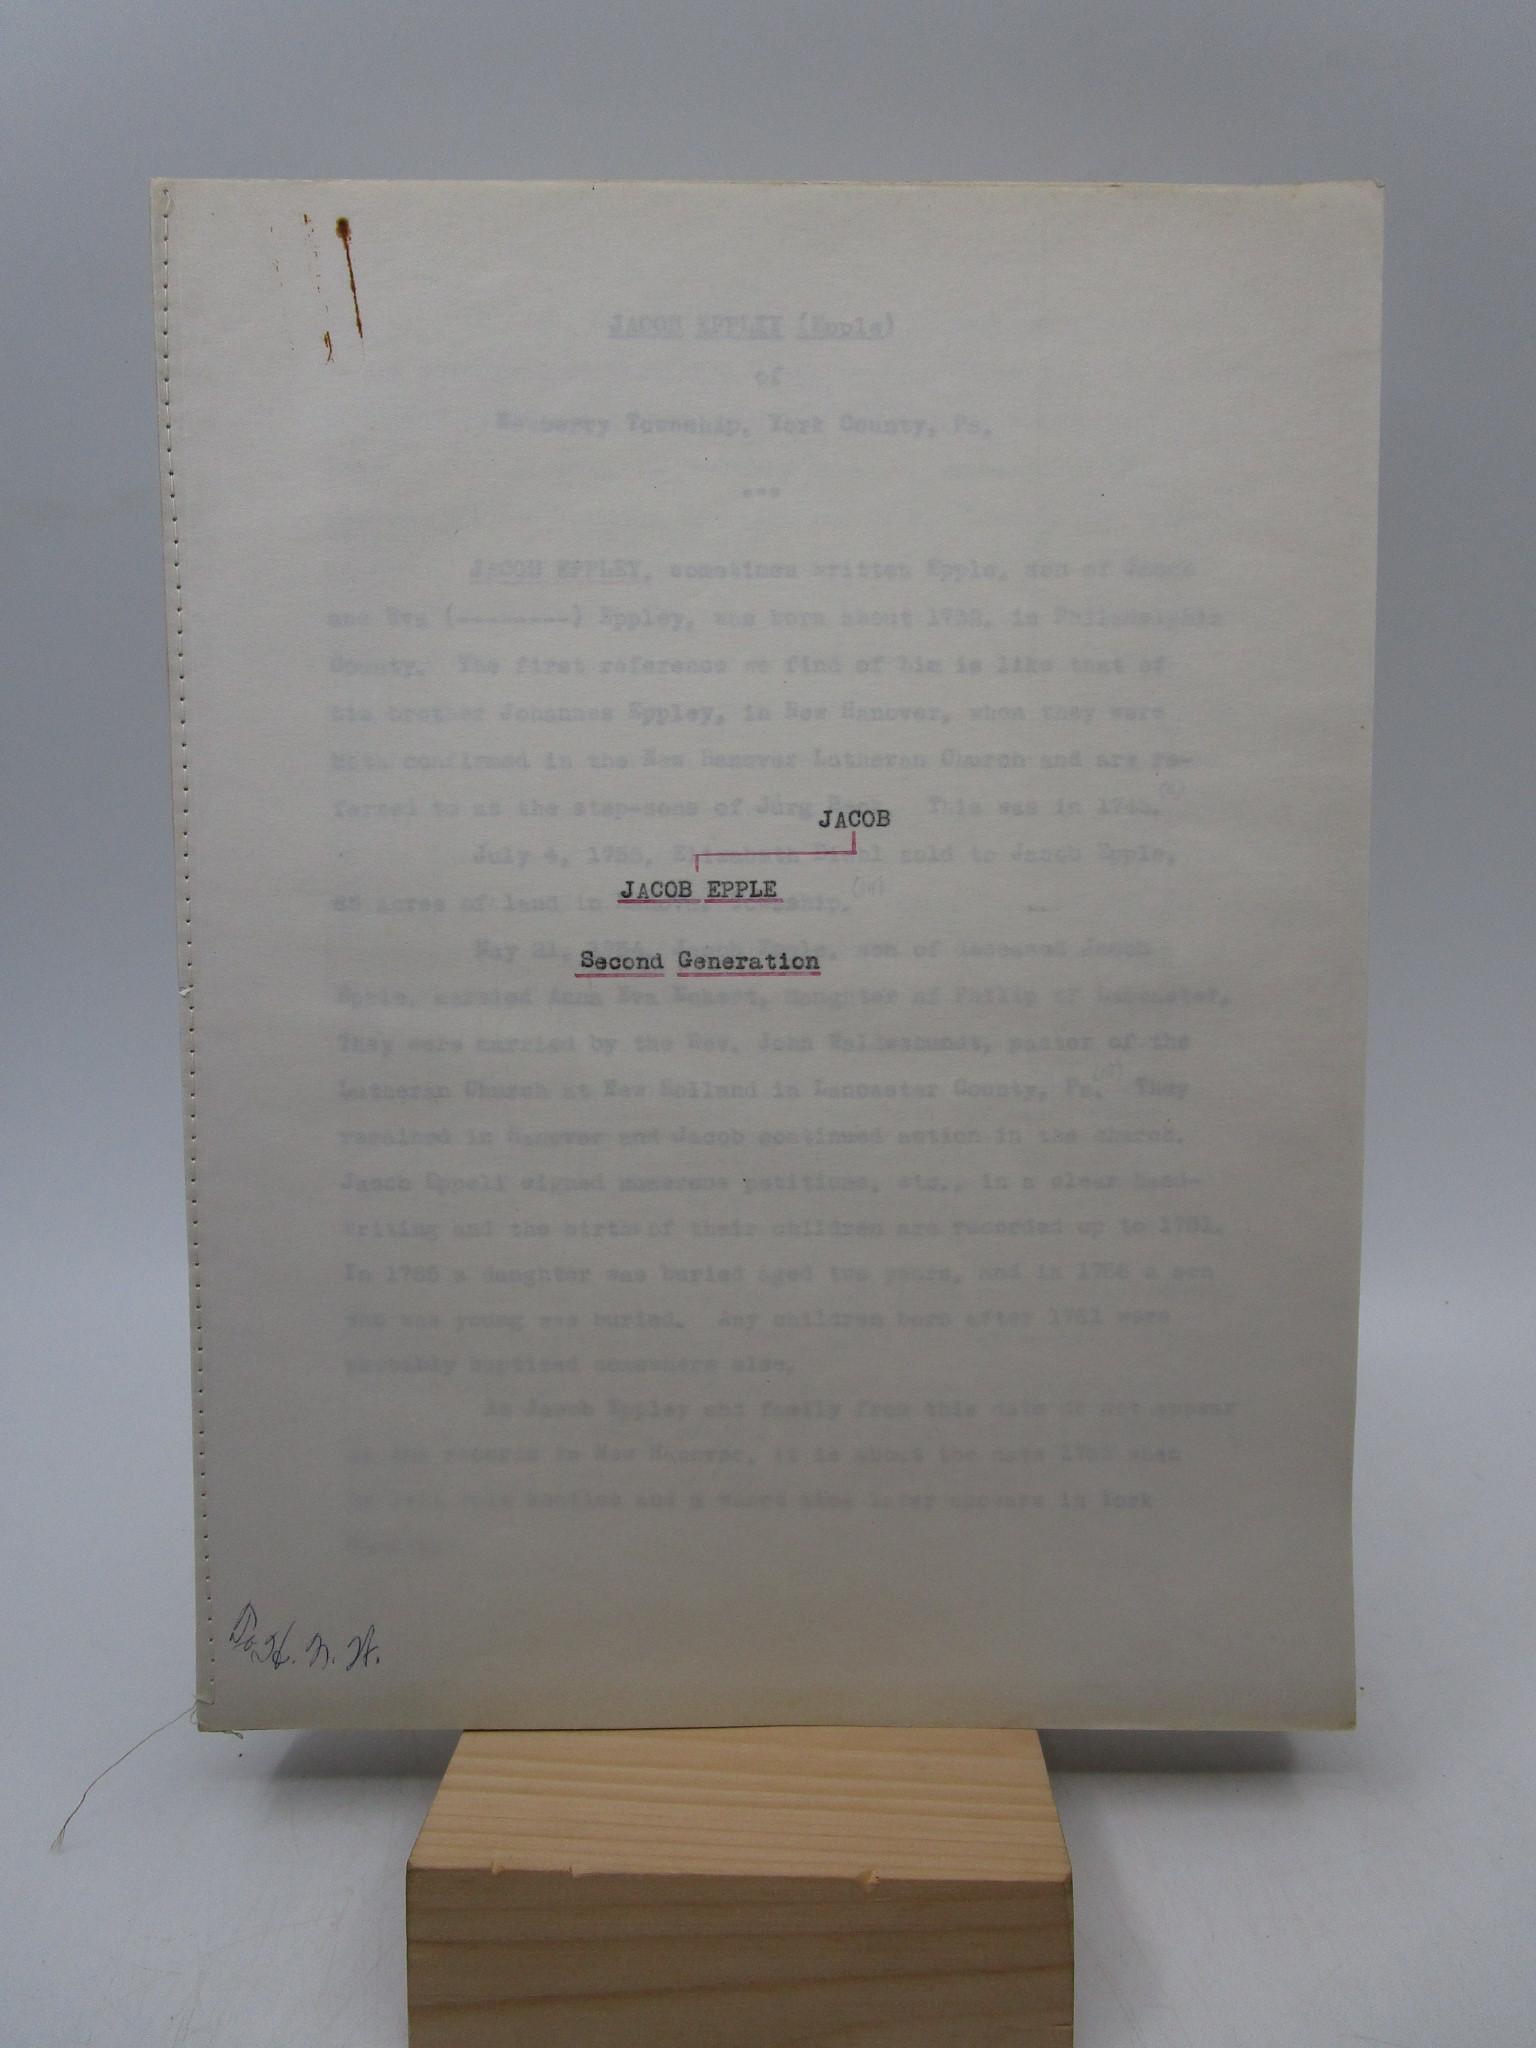 Image for Eppley Family, Jacob Epple (Second Generation), Other Eppley Families, Family No. 5, Erskine Family, Zimmerman-Eppley (Six Manuscripts)